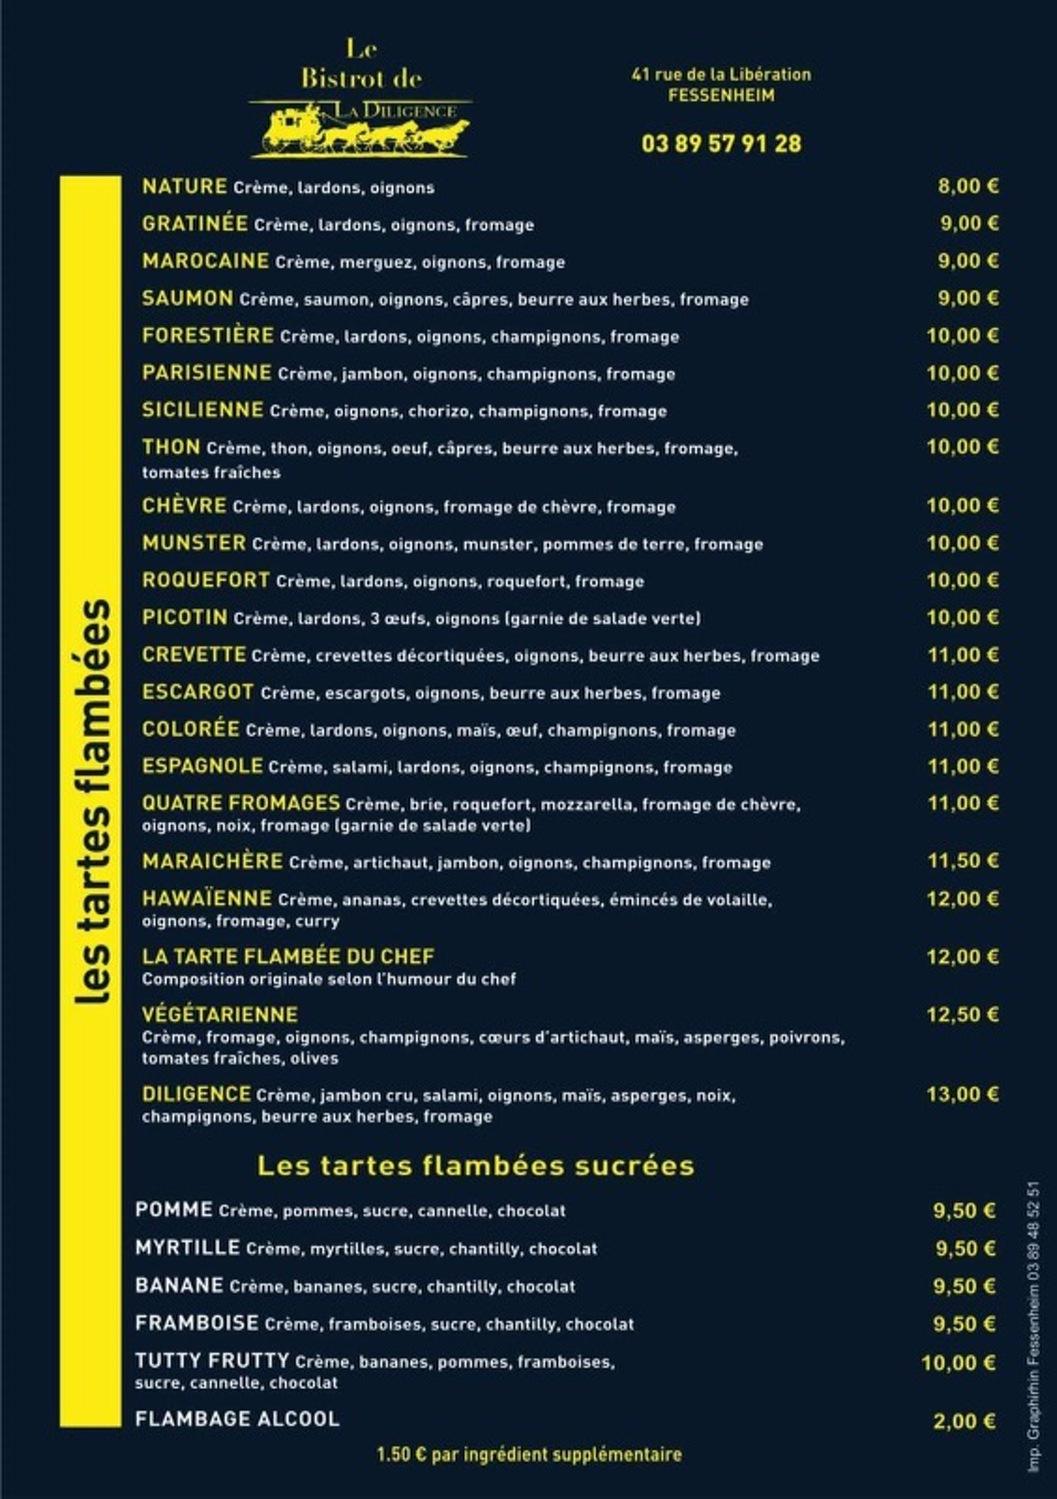 restaurant-diligence-carte-tartes-flambees